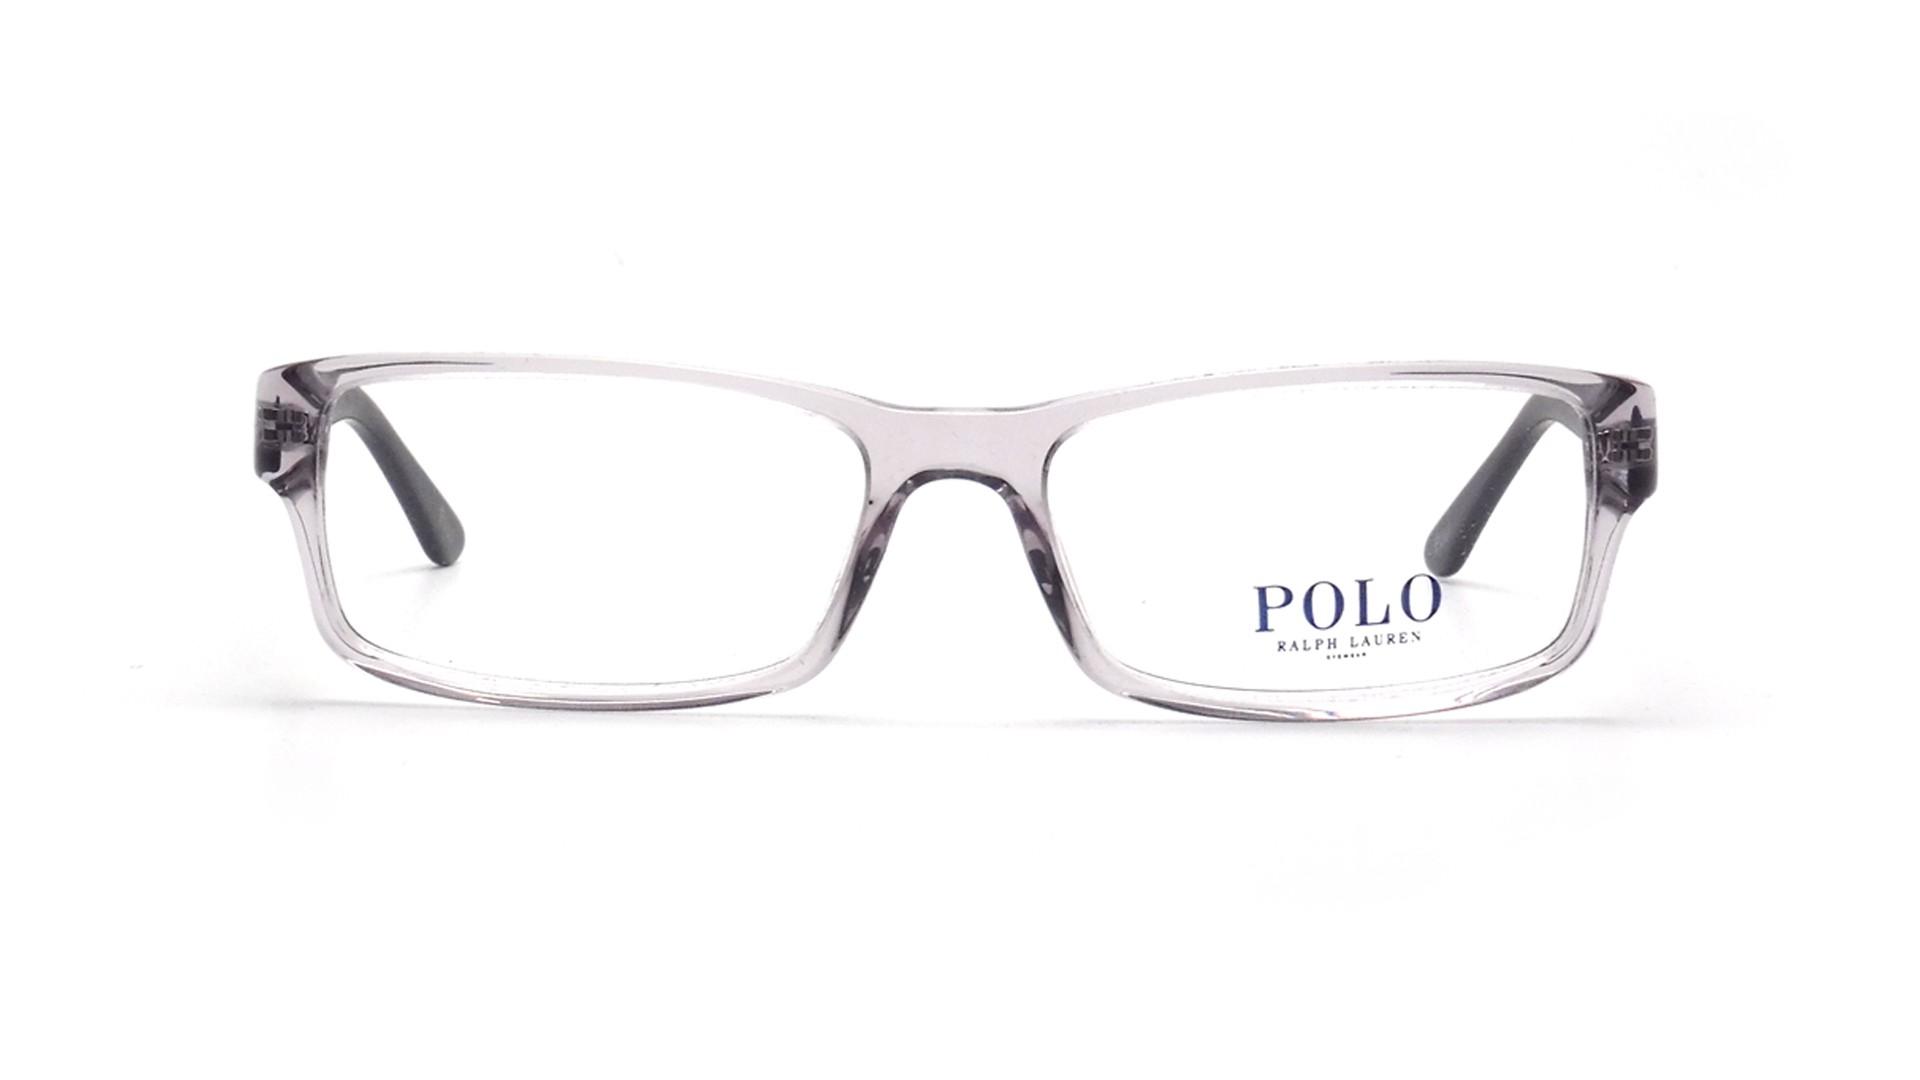 Polo Ralph Lauren Ph 54 16 Transparent